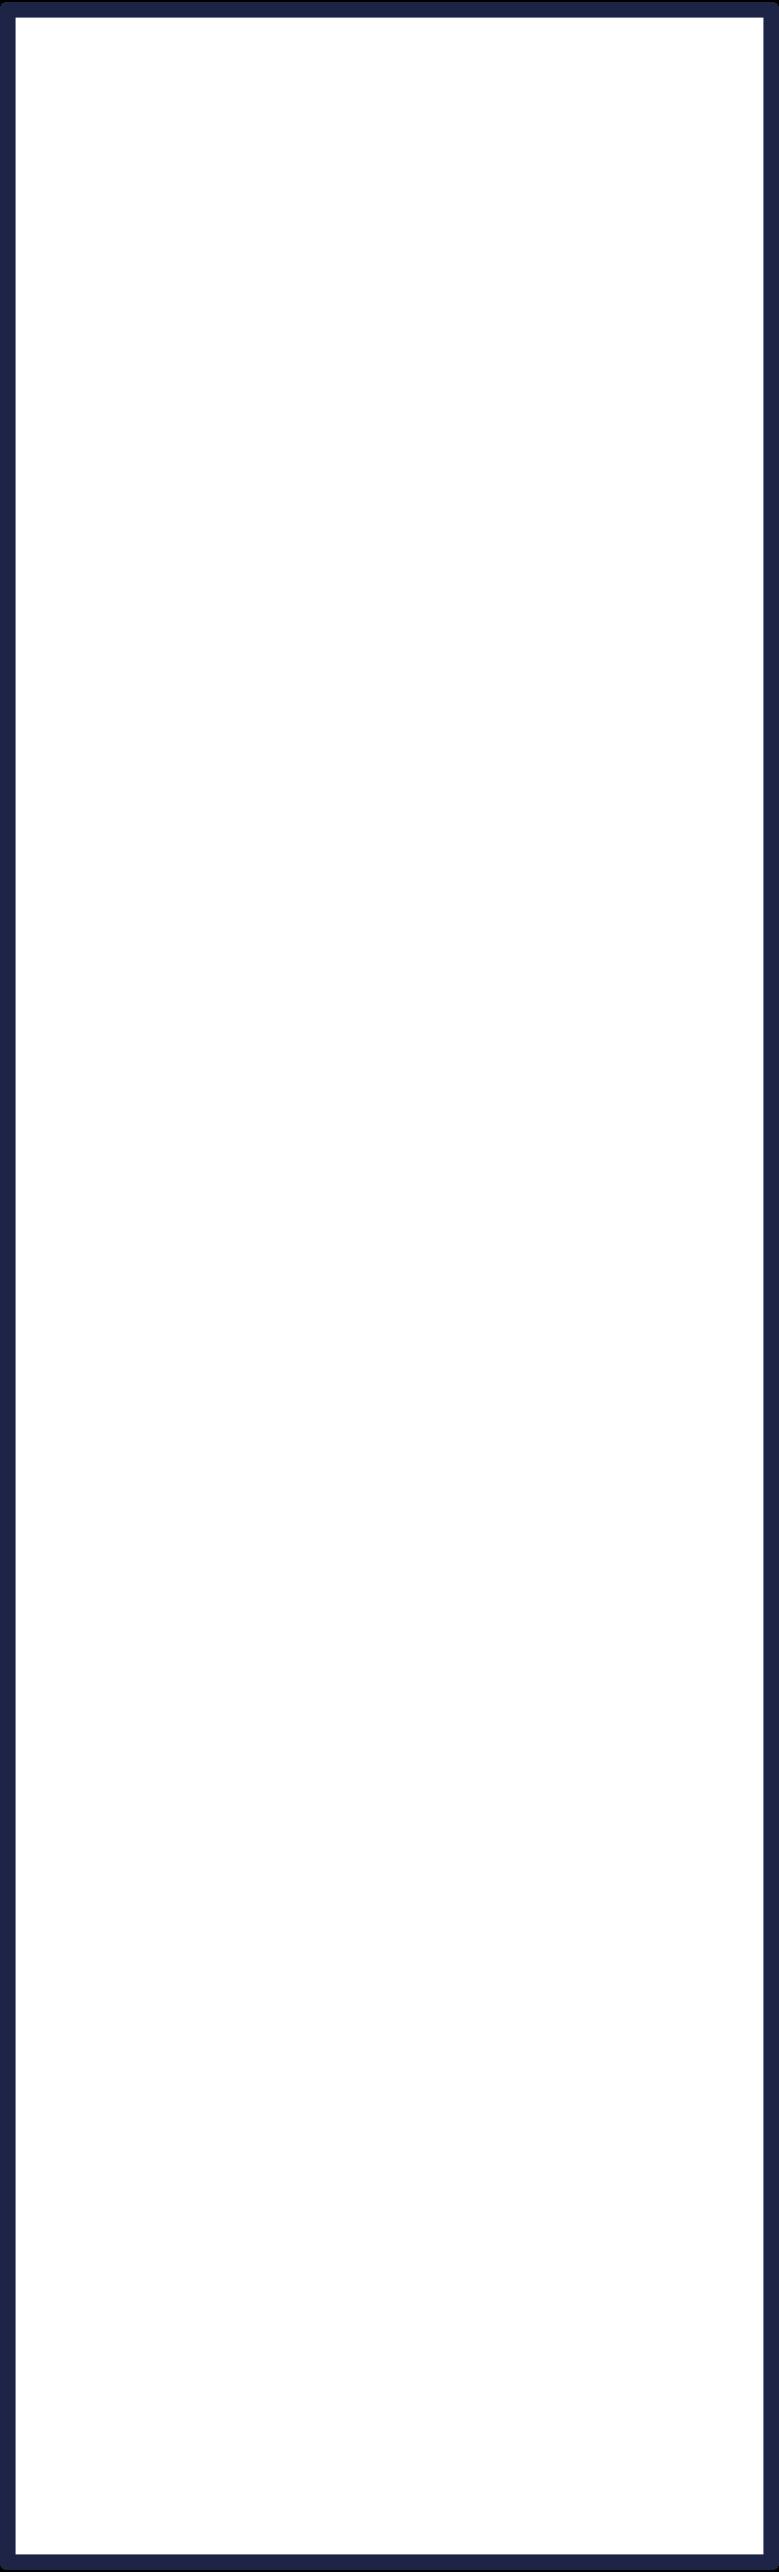 london building 2 line Clipart illustration in PNG, SVG